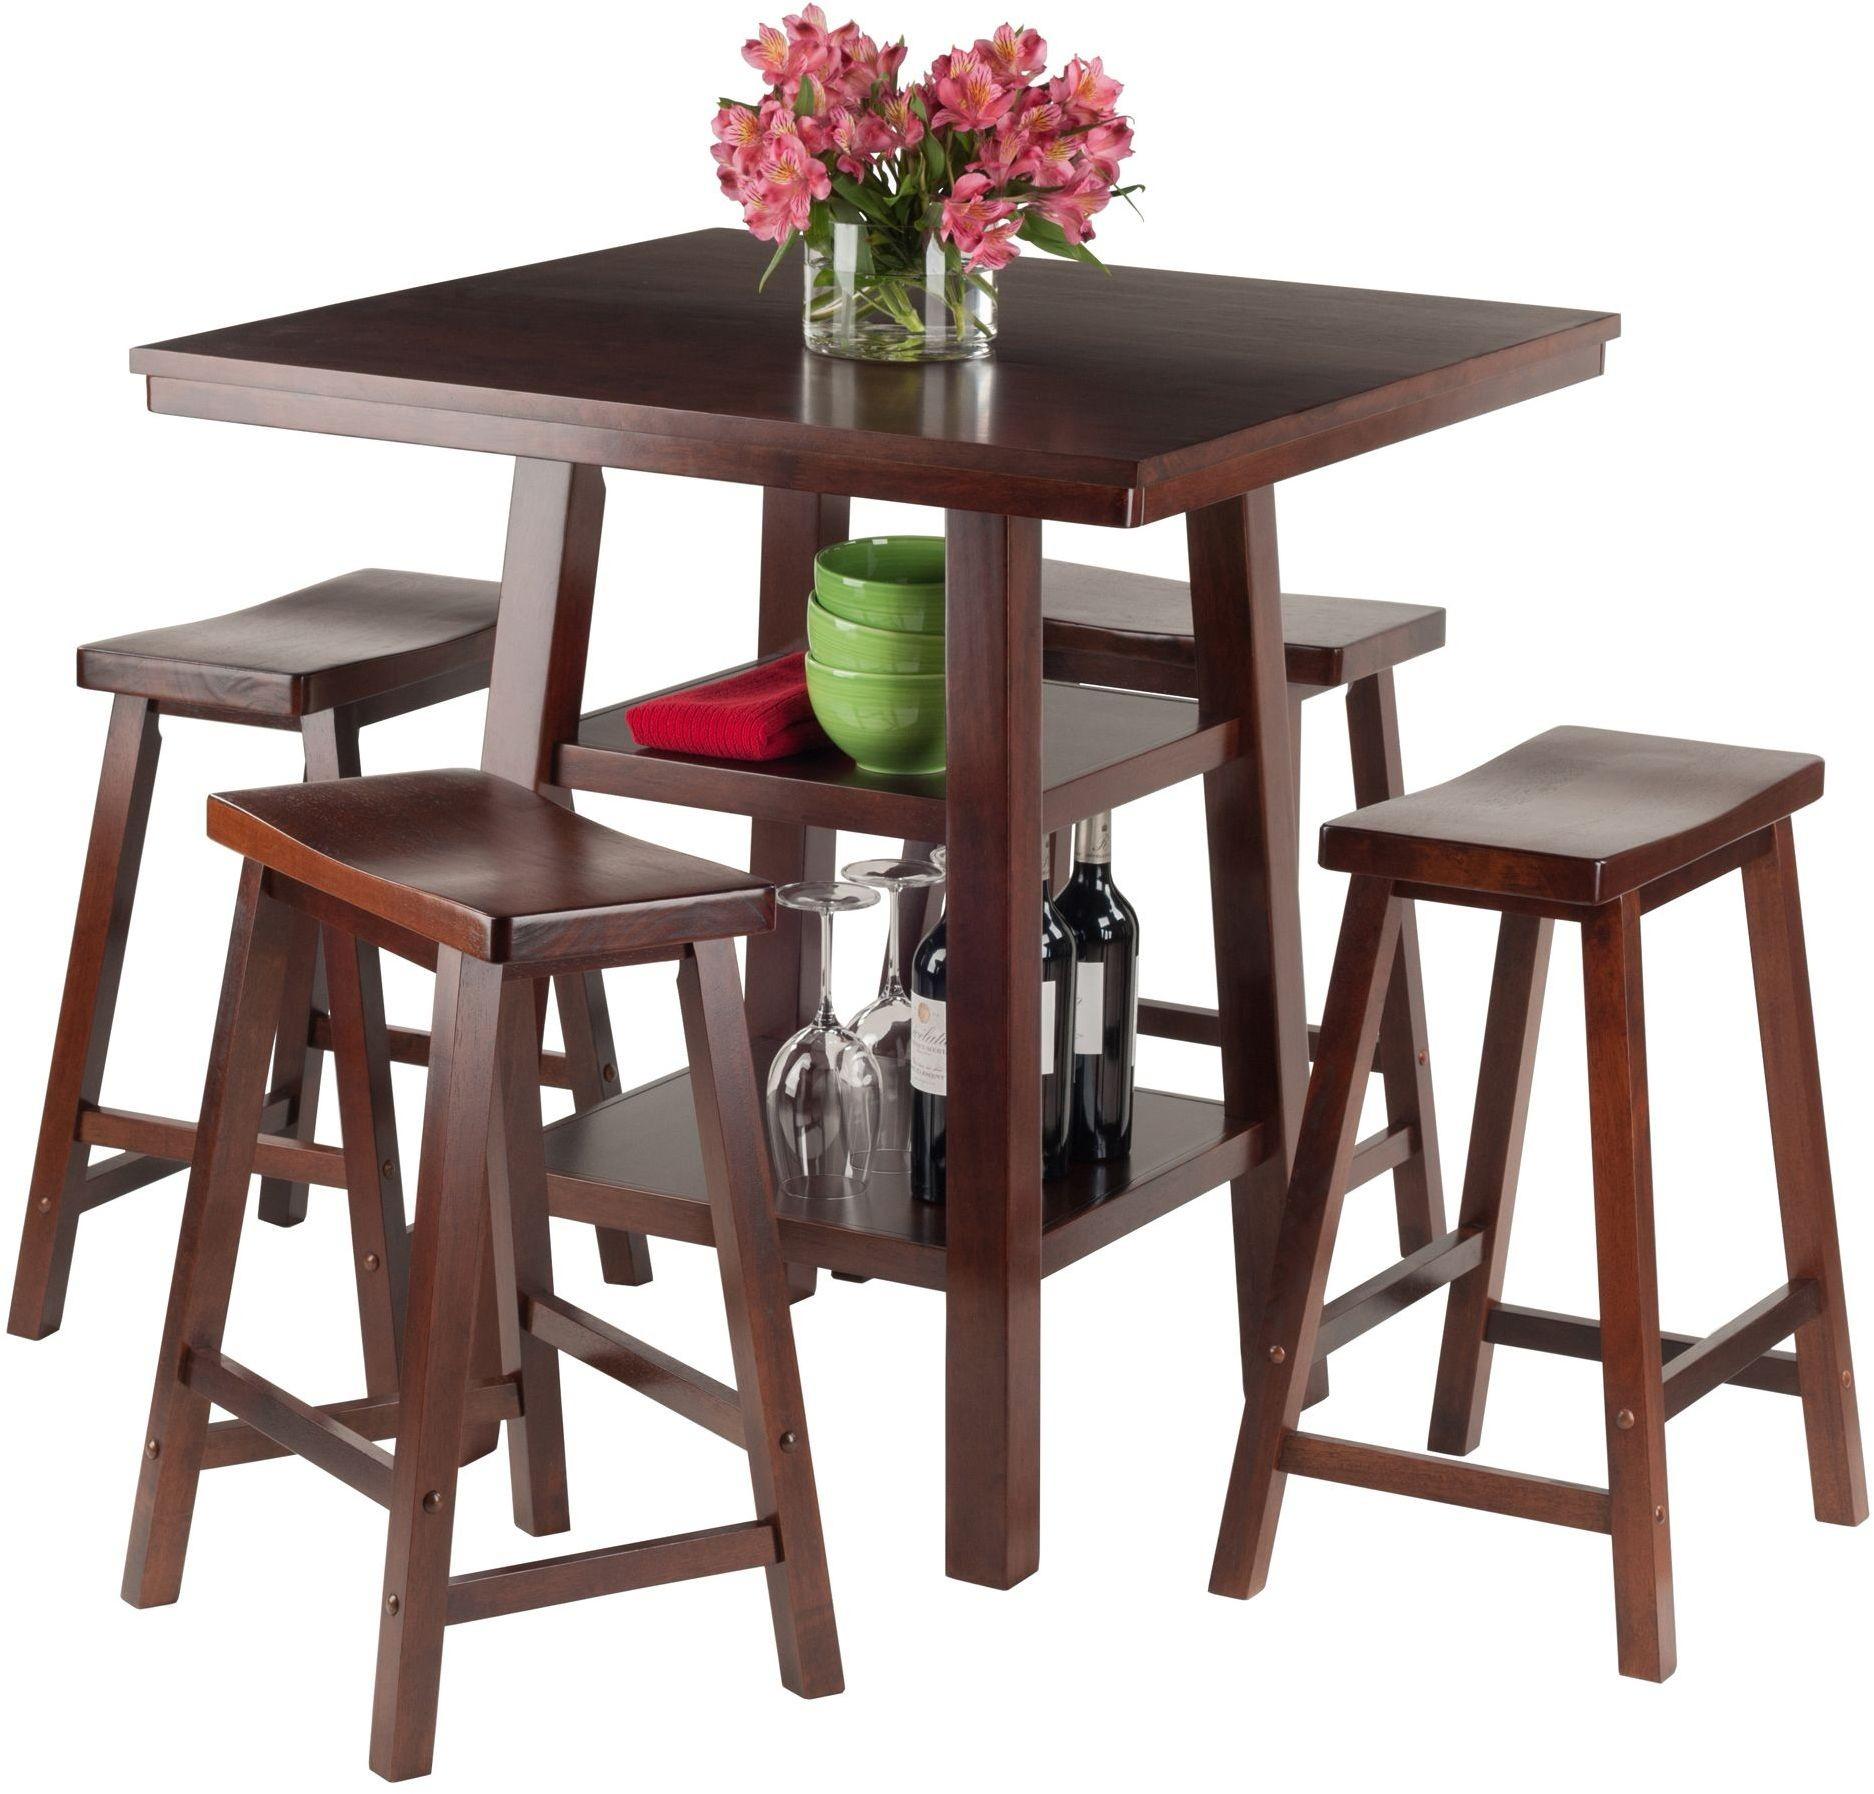 Orlando 5 Piece Walnut Counter Height Dining Set With